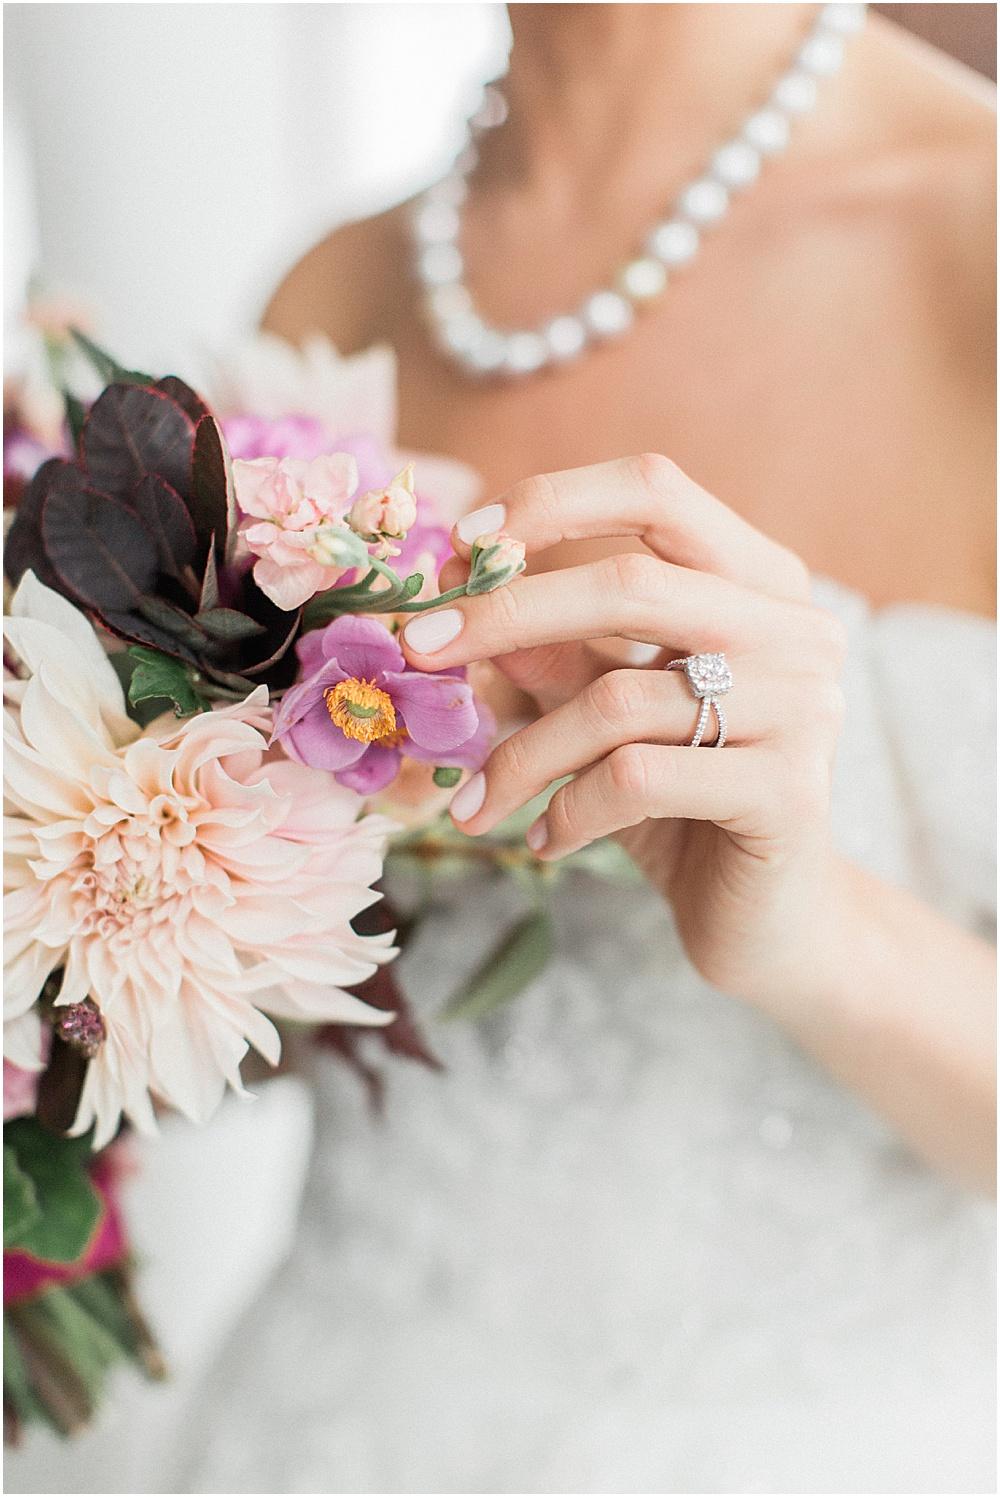 styled_shoot_fall_valentines_day_wedding_rhodi_island_ma_boston_wedding_photographyer_meredith_jane_photography_photo_0039.jpg